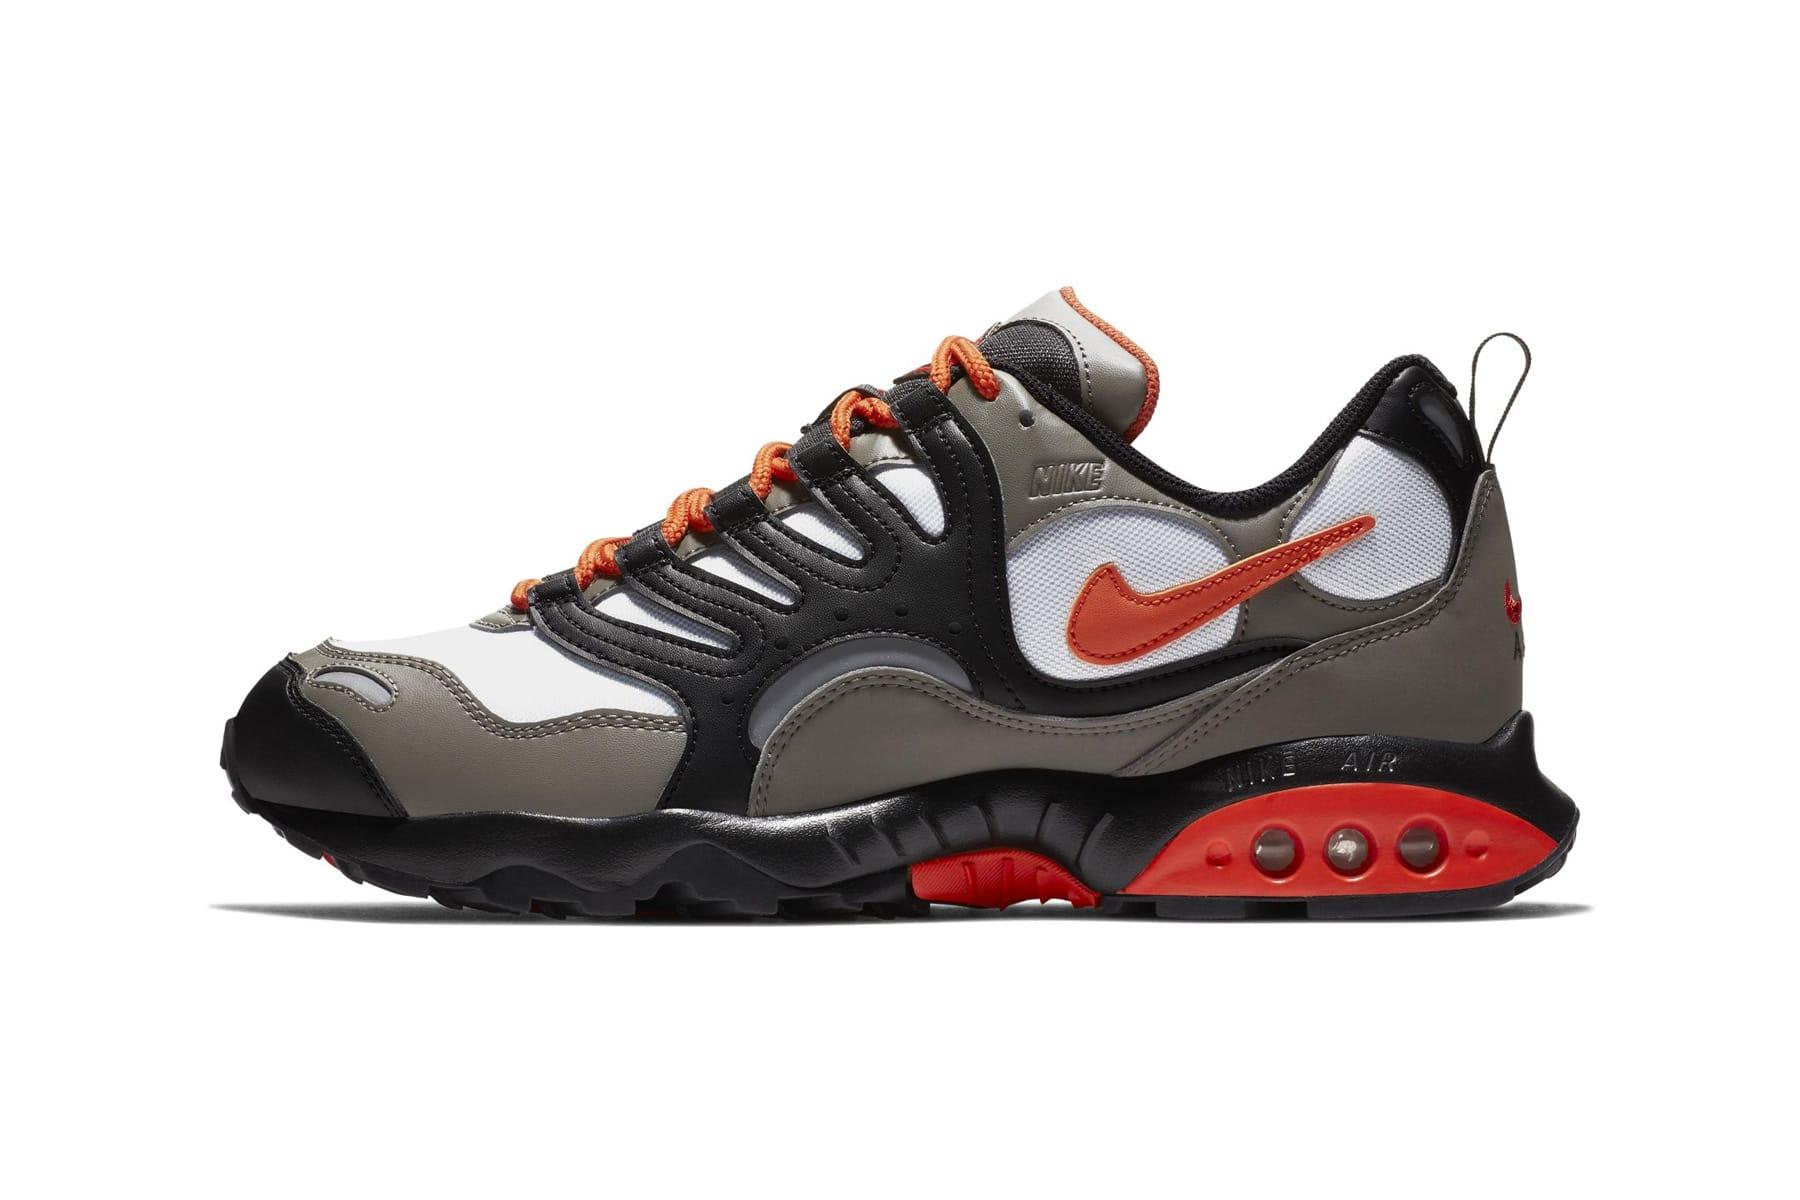 Nike Air Terra Humara '18 First Look